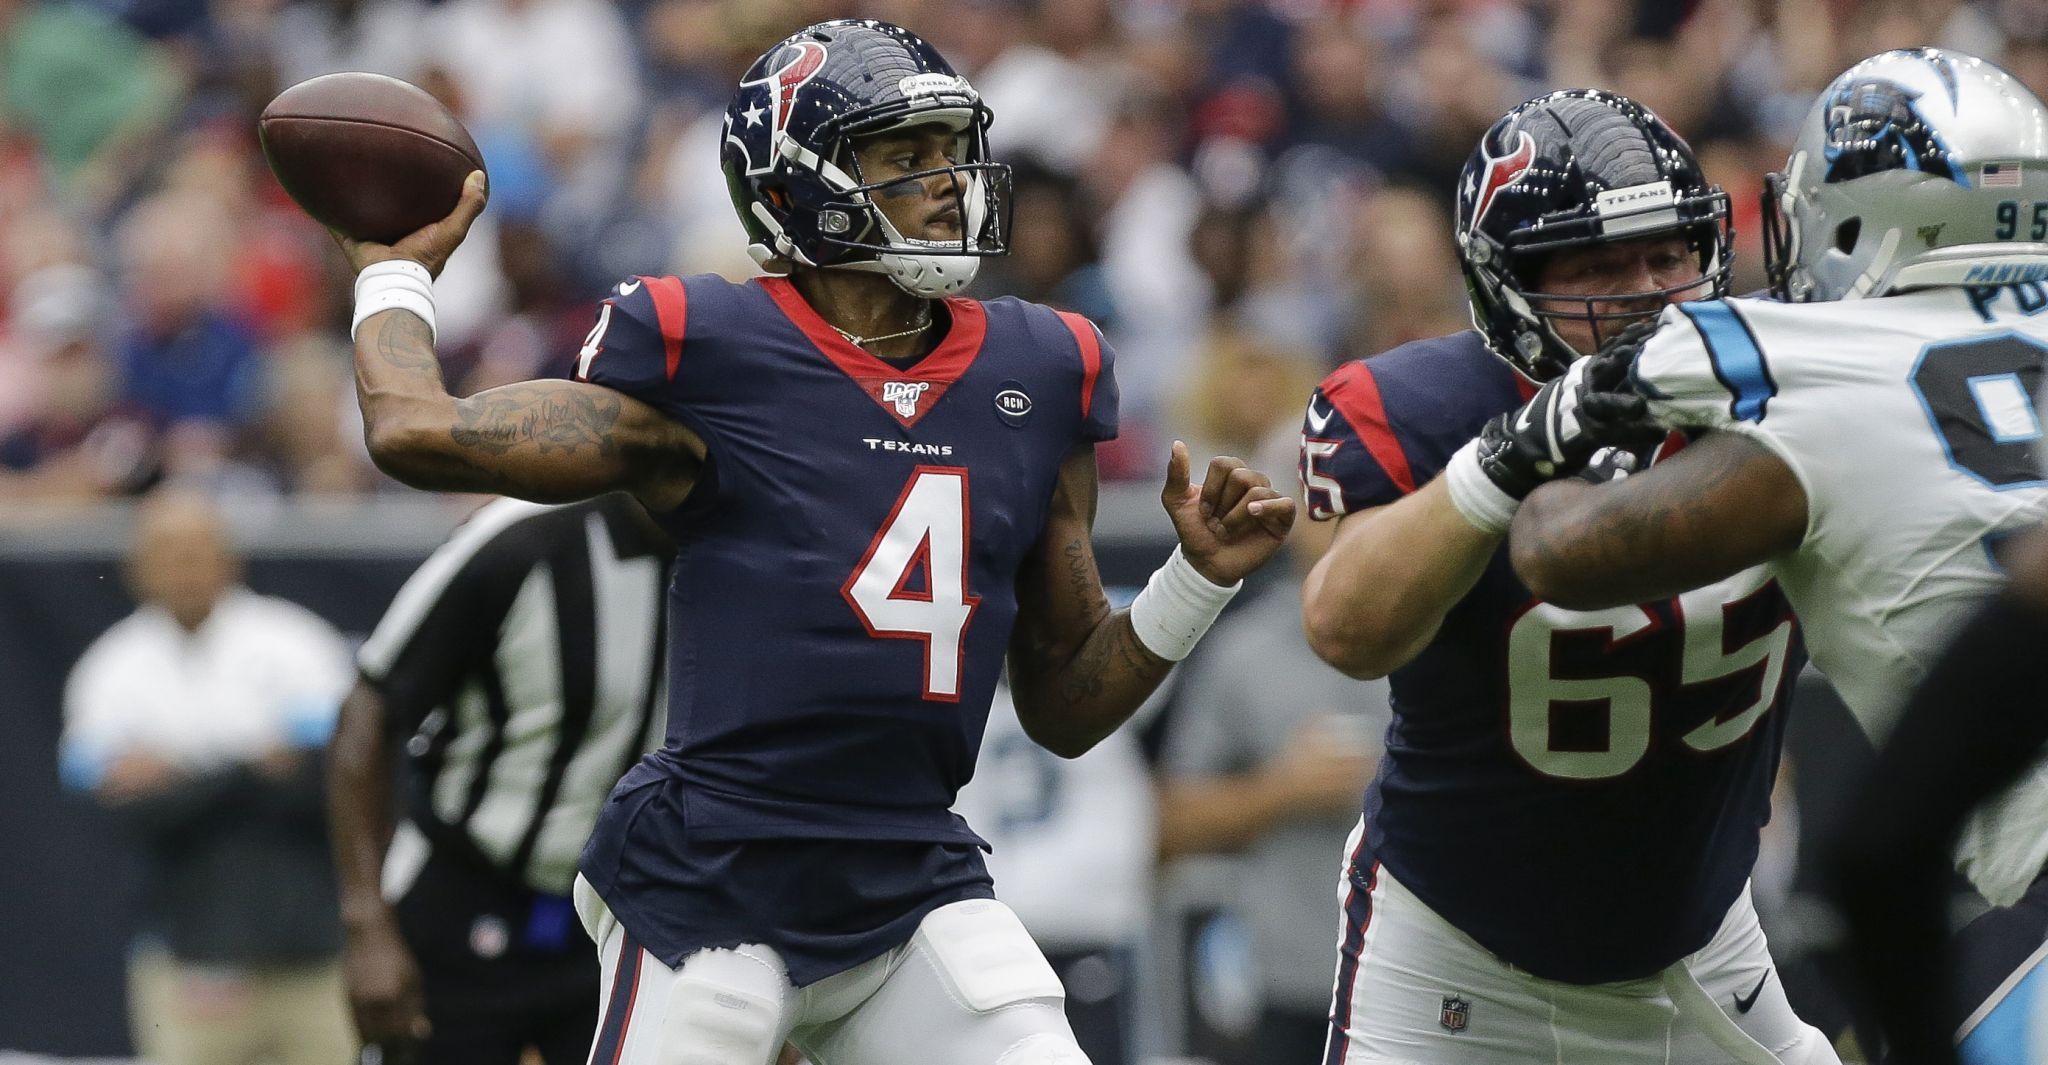 Texans vs. Falcons: John McClain's scouting report